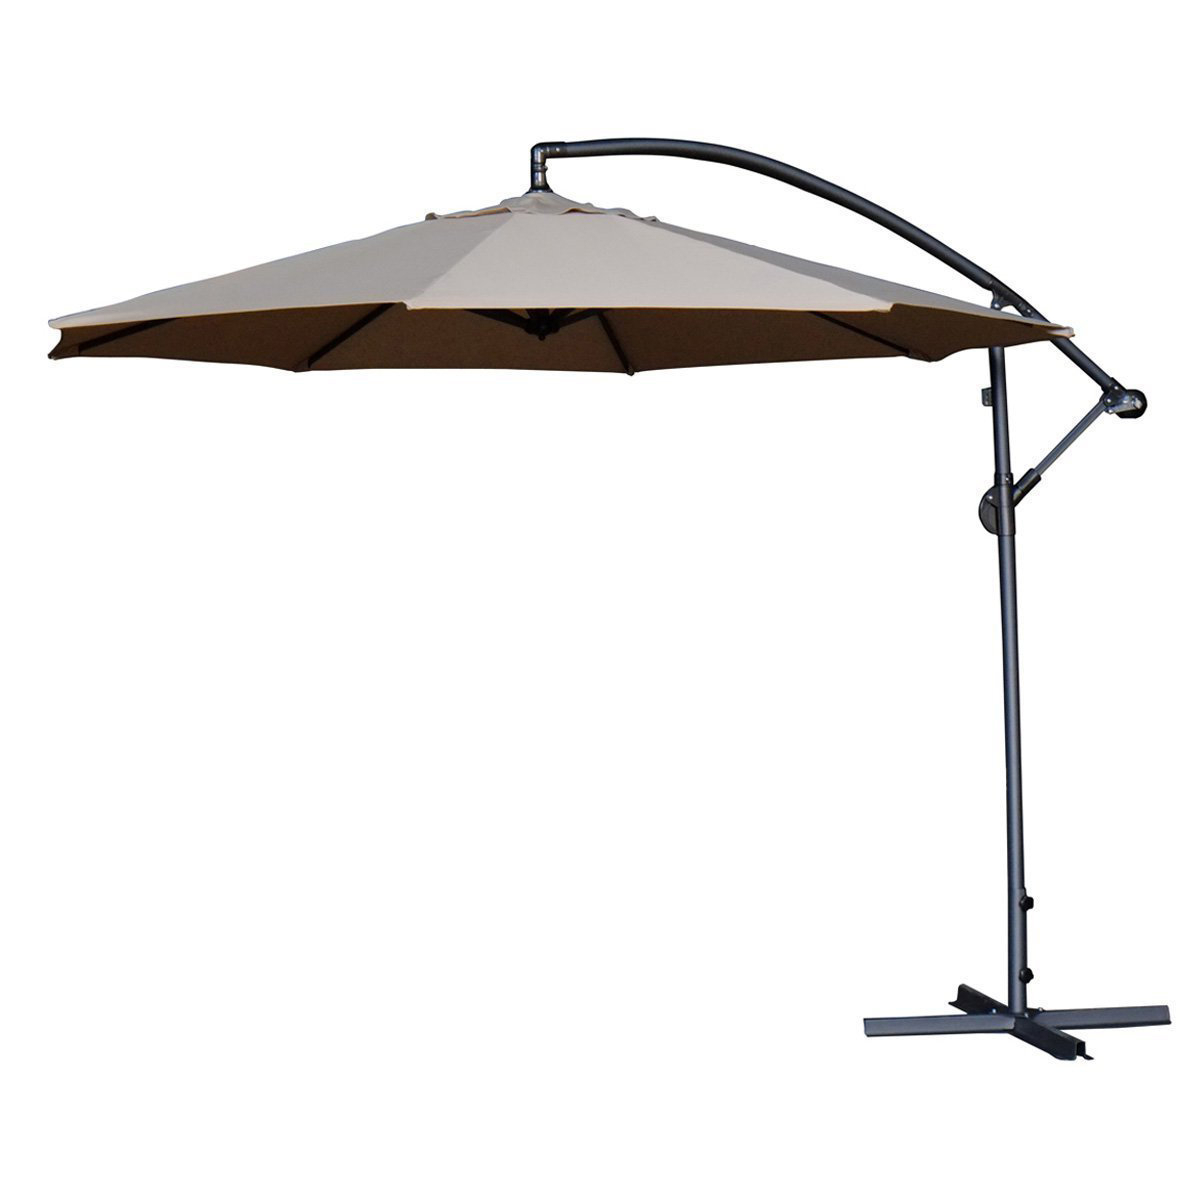 Bondi Square Cantilever Umbrellas Throughout Most Popular Irven 10' Cantilever Umbrella (Gallery 20 of 20)